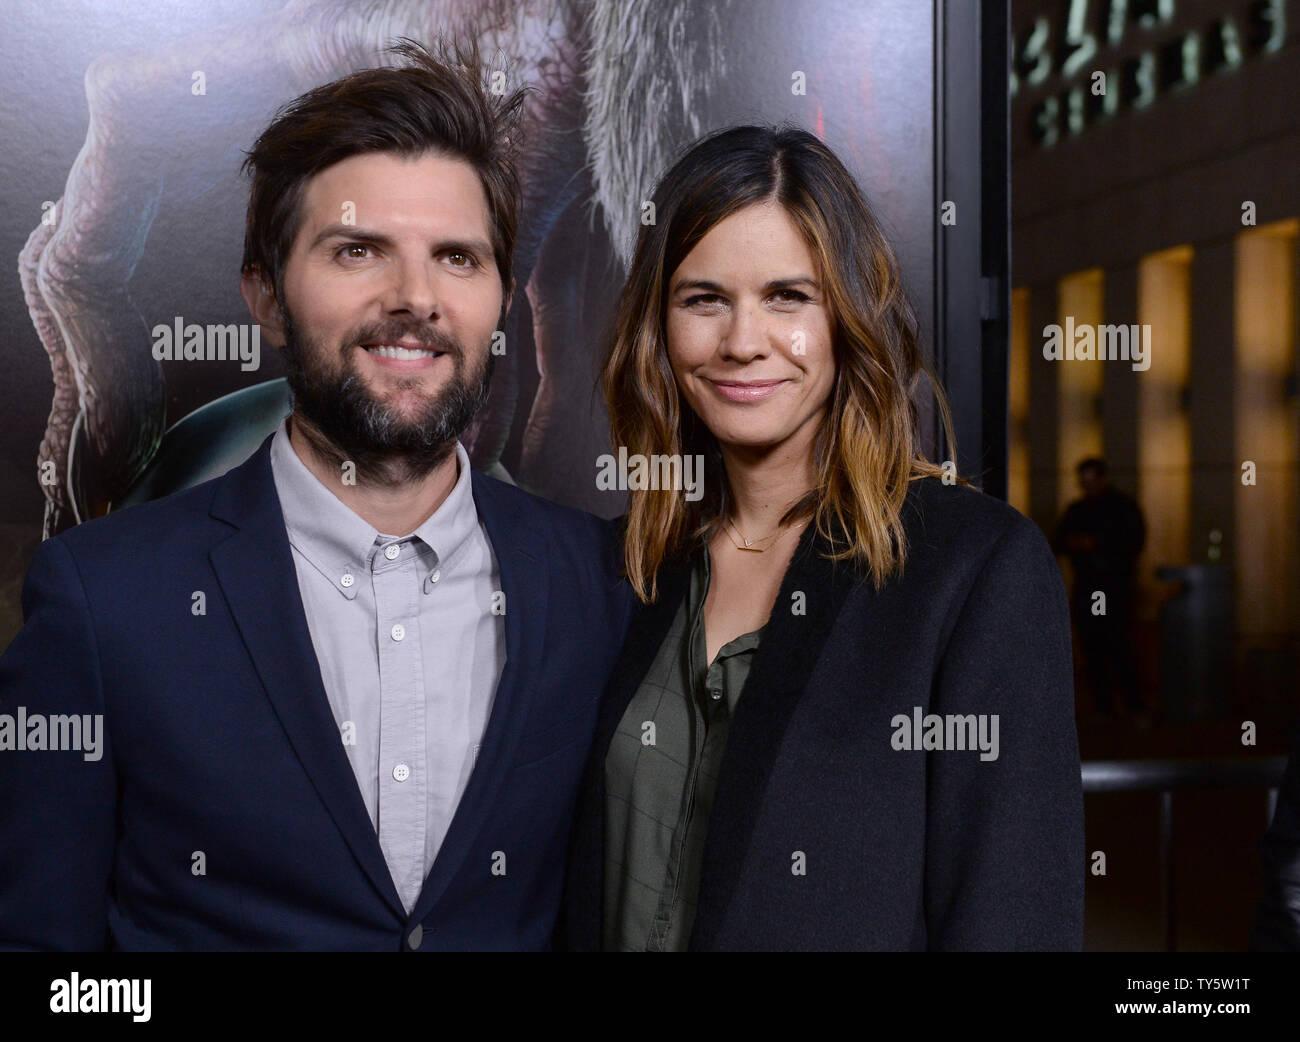 The Spirit Of Christmas Cast.Cast Member Adam Scott And His Wife Writer Naomi Scott